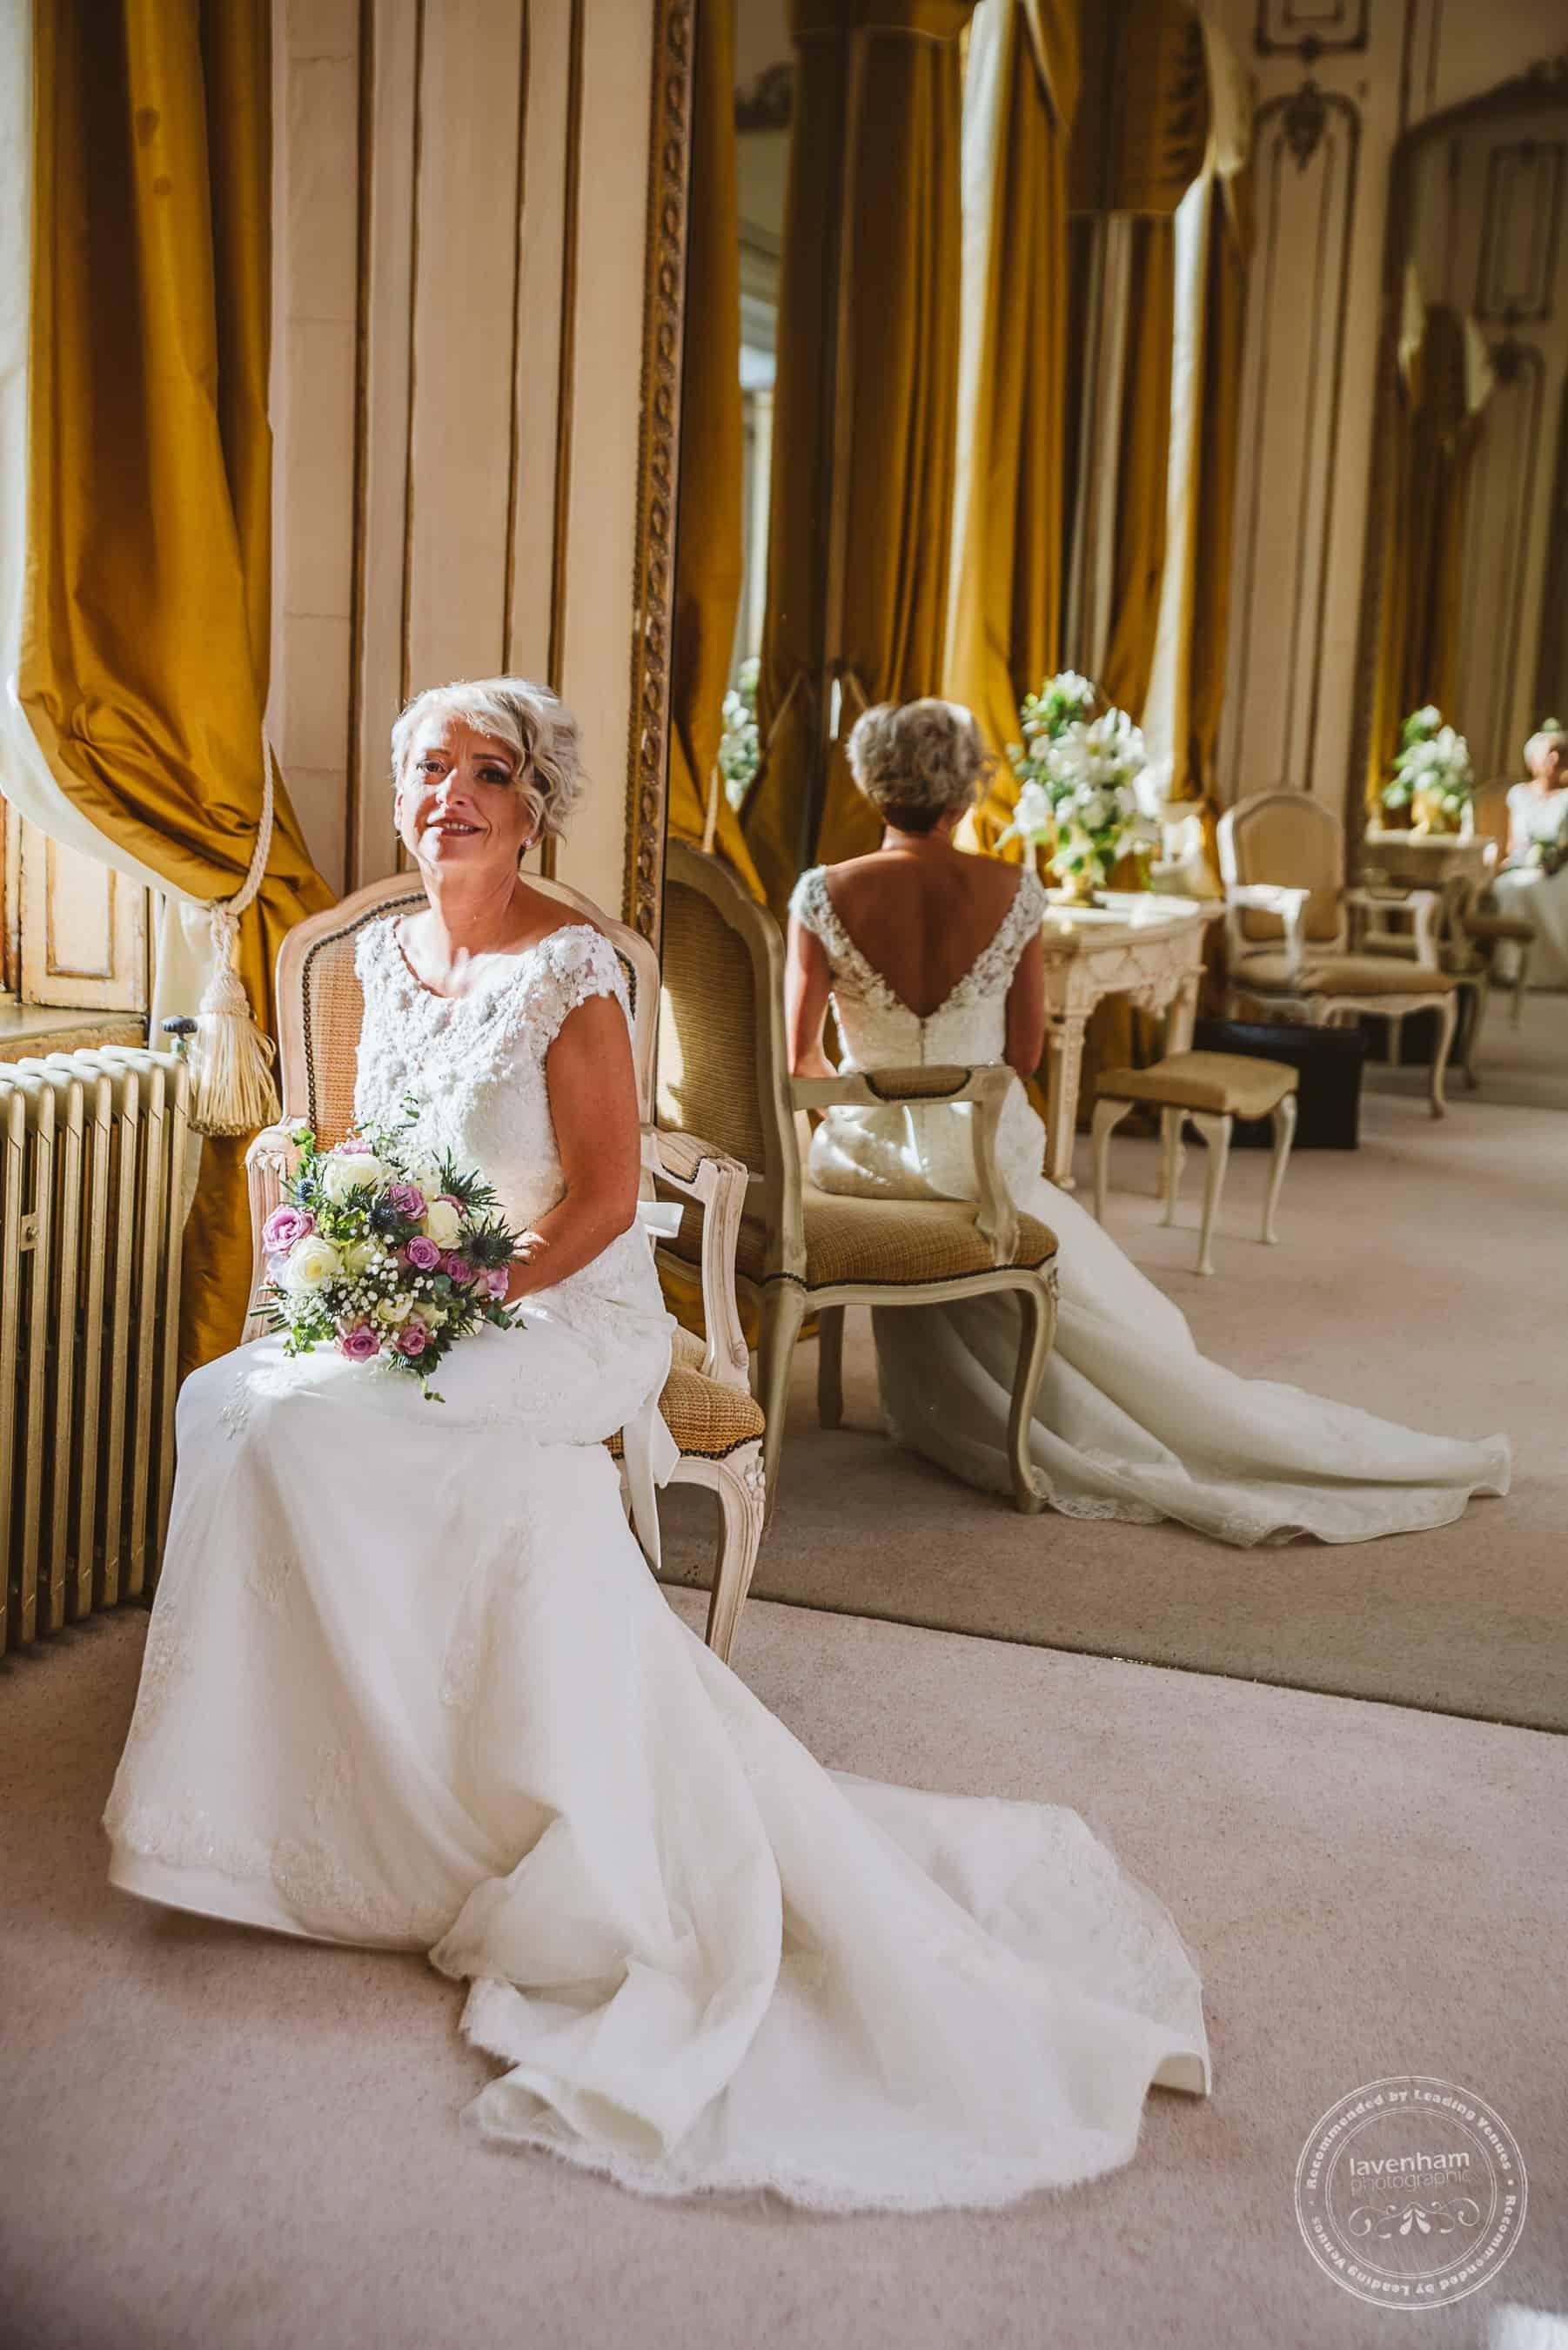 281018 Gosfield Hall Wedding Photography Lavenham Photographic 035